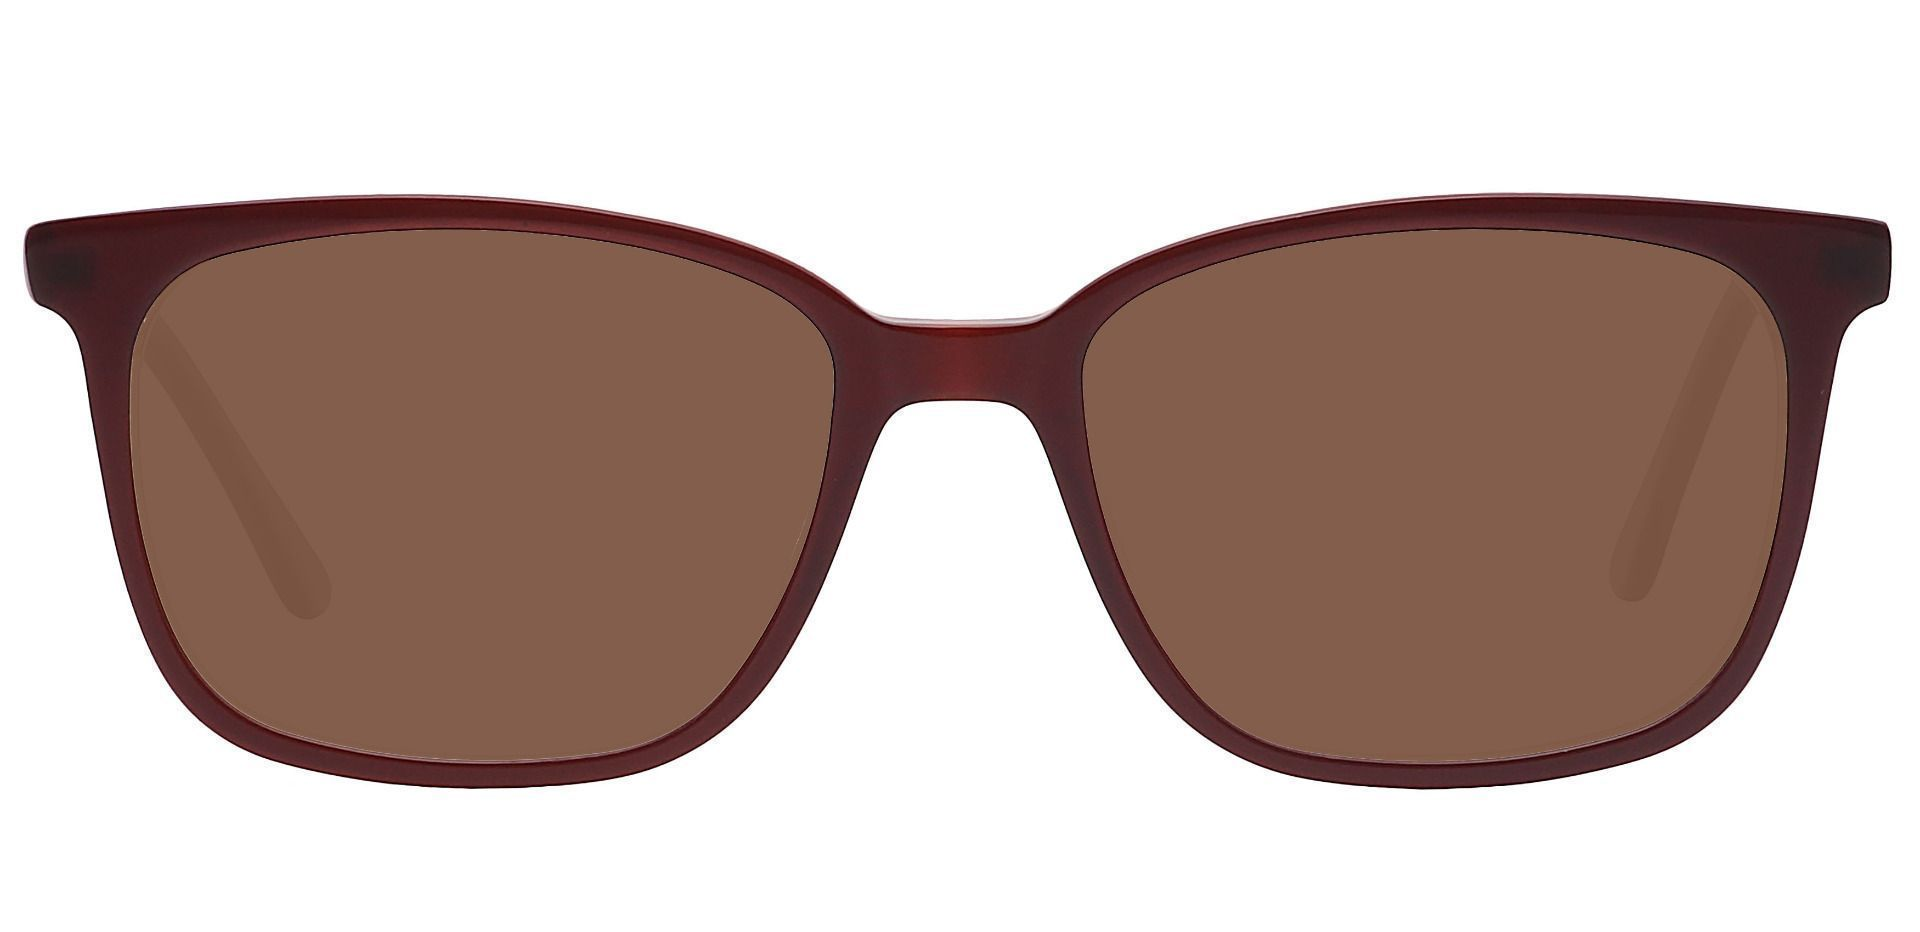 Fern Square Prescription Sunglasses - Brown Frame With Brown Lenses